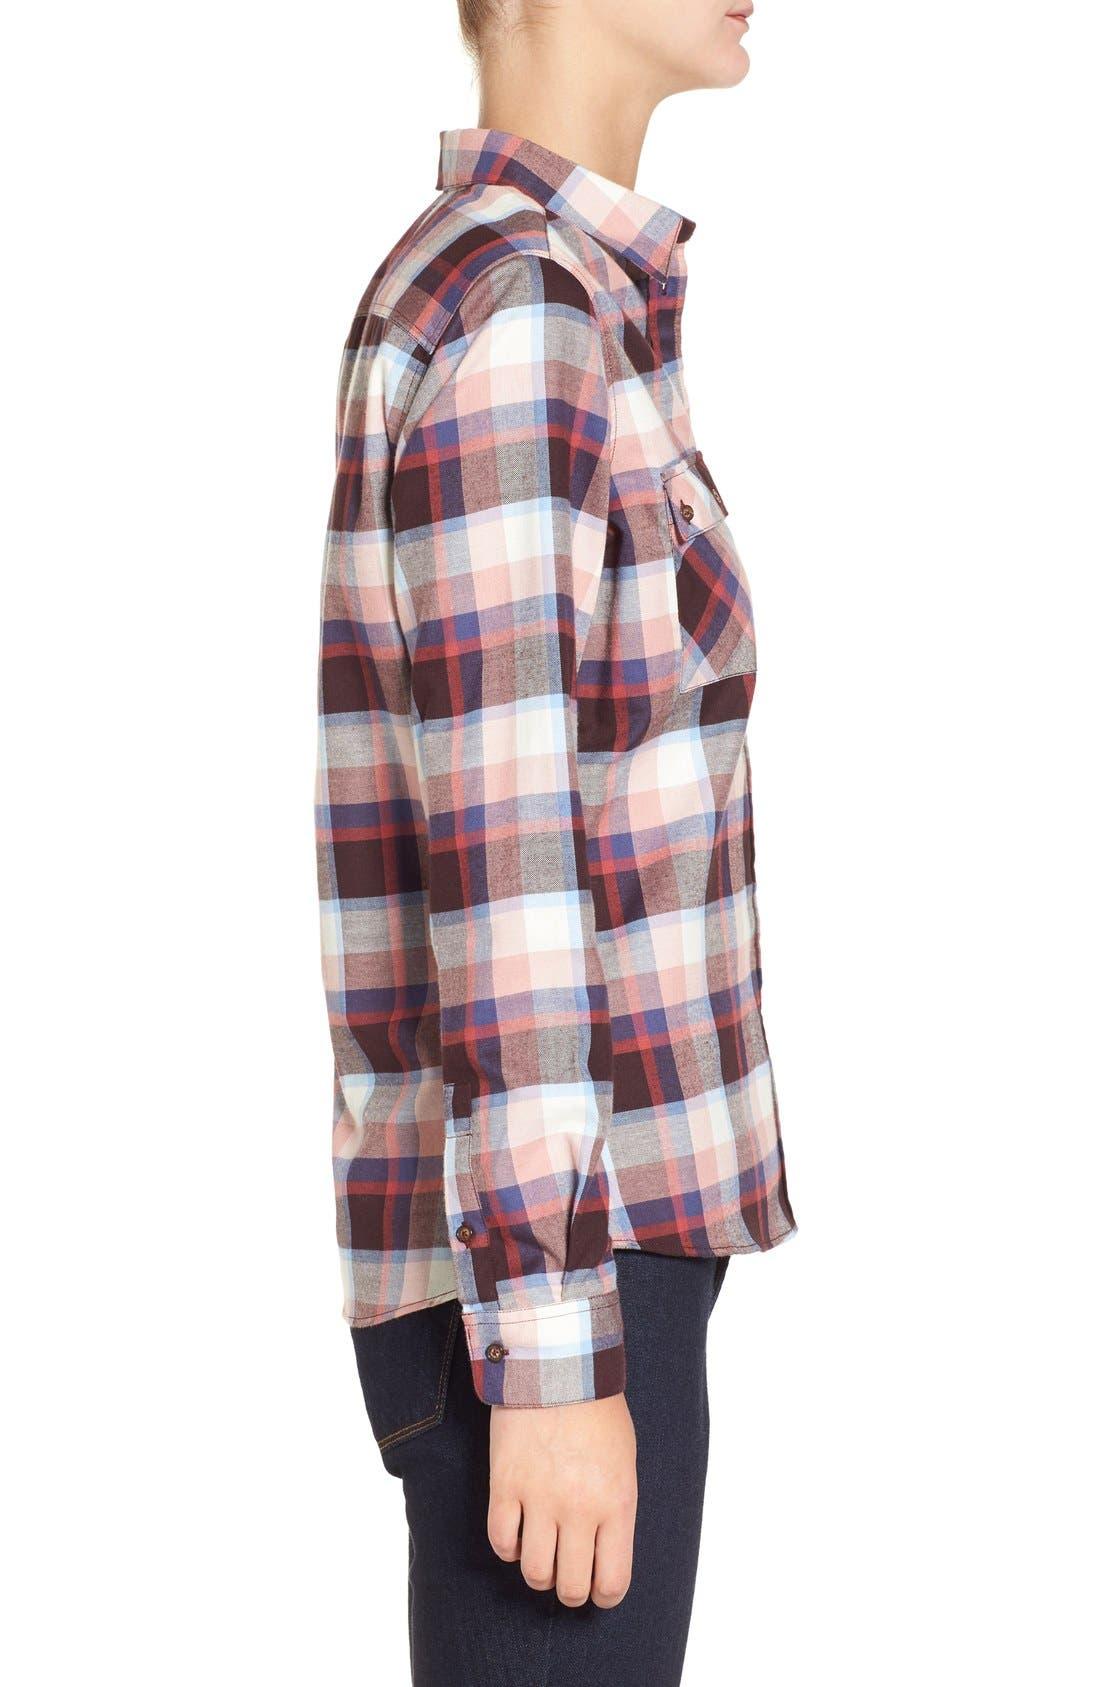 'Darwen' Plaid Shirt,                             Alternate thumbnail 3, color,                             Pink Check